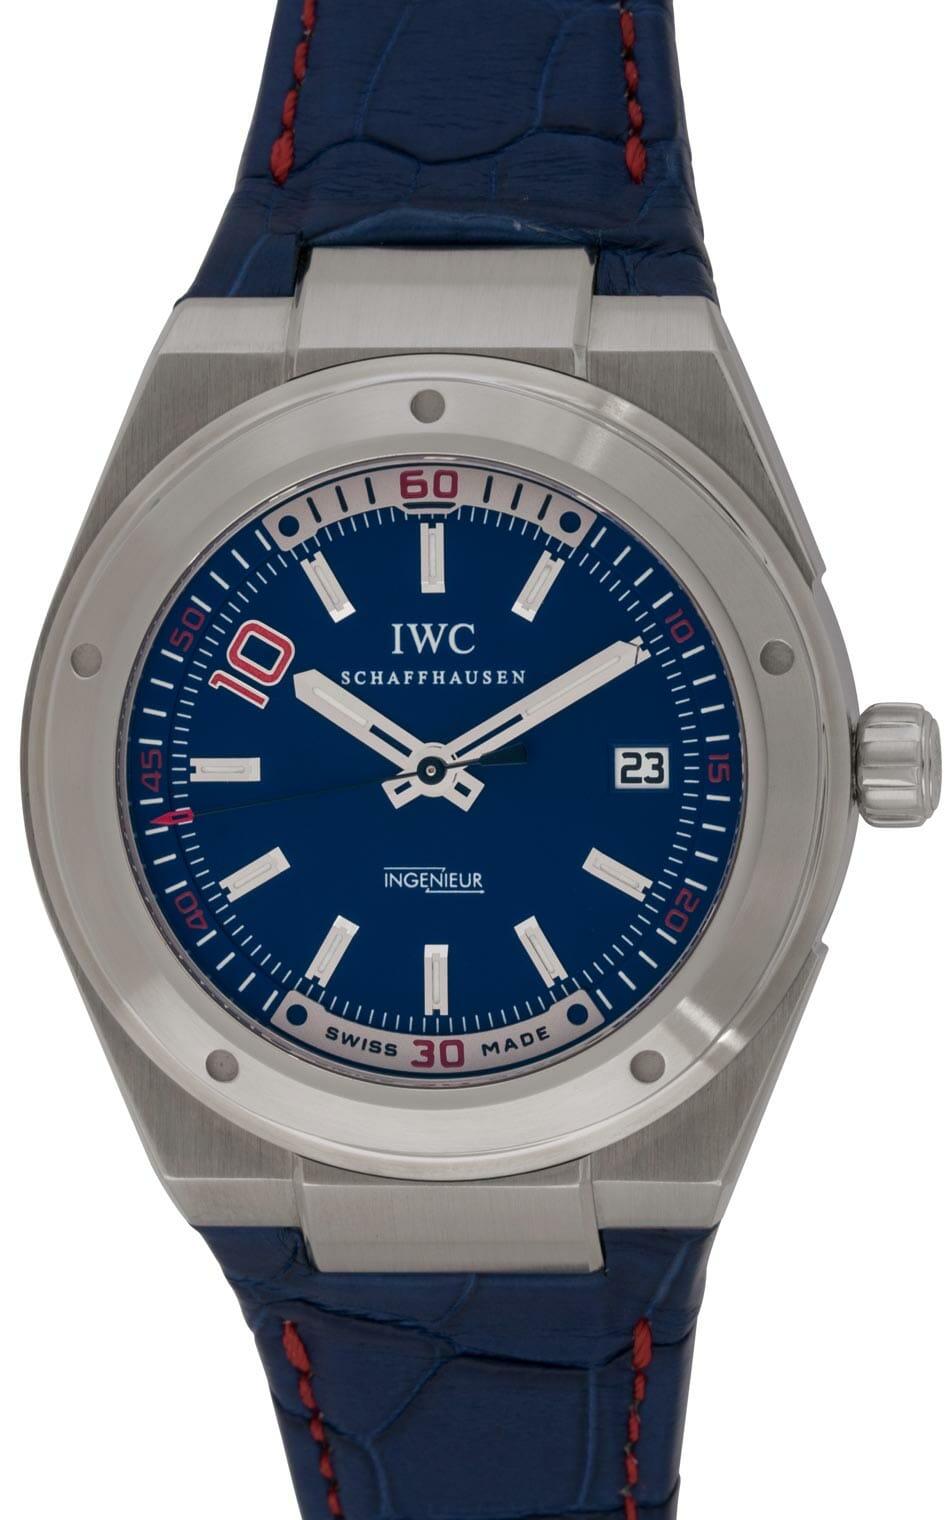 IWC - Ingenieur Zinedine Zidane Limited Edition